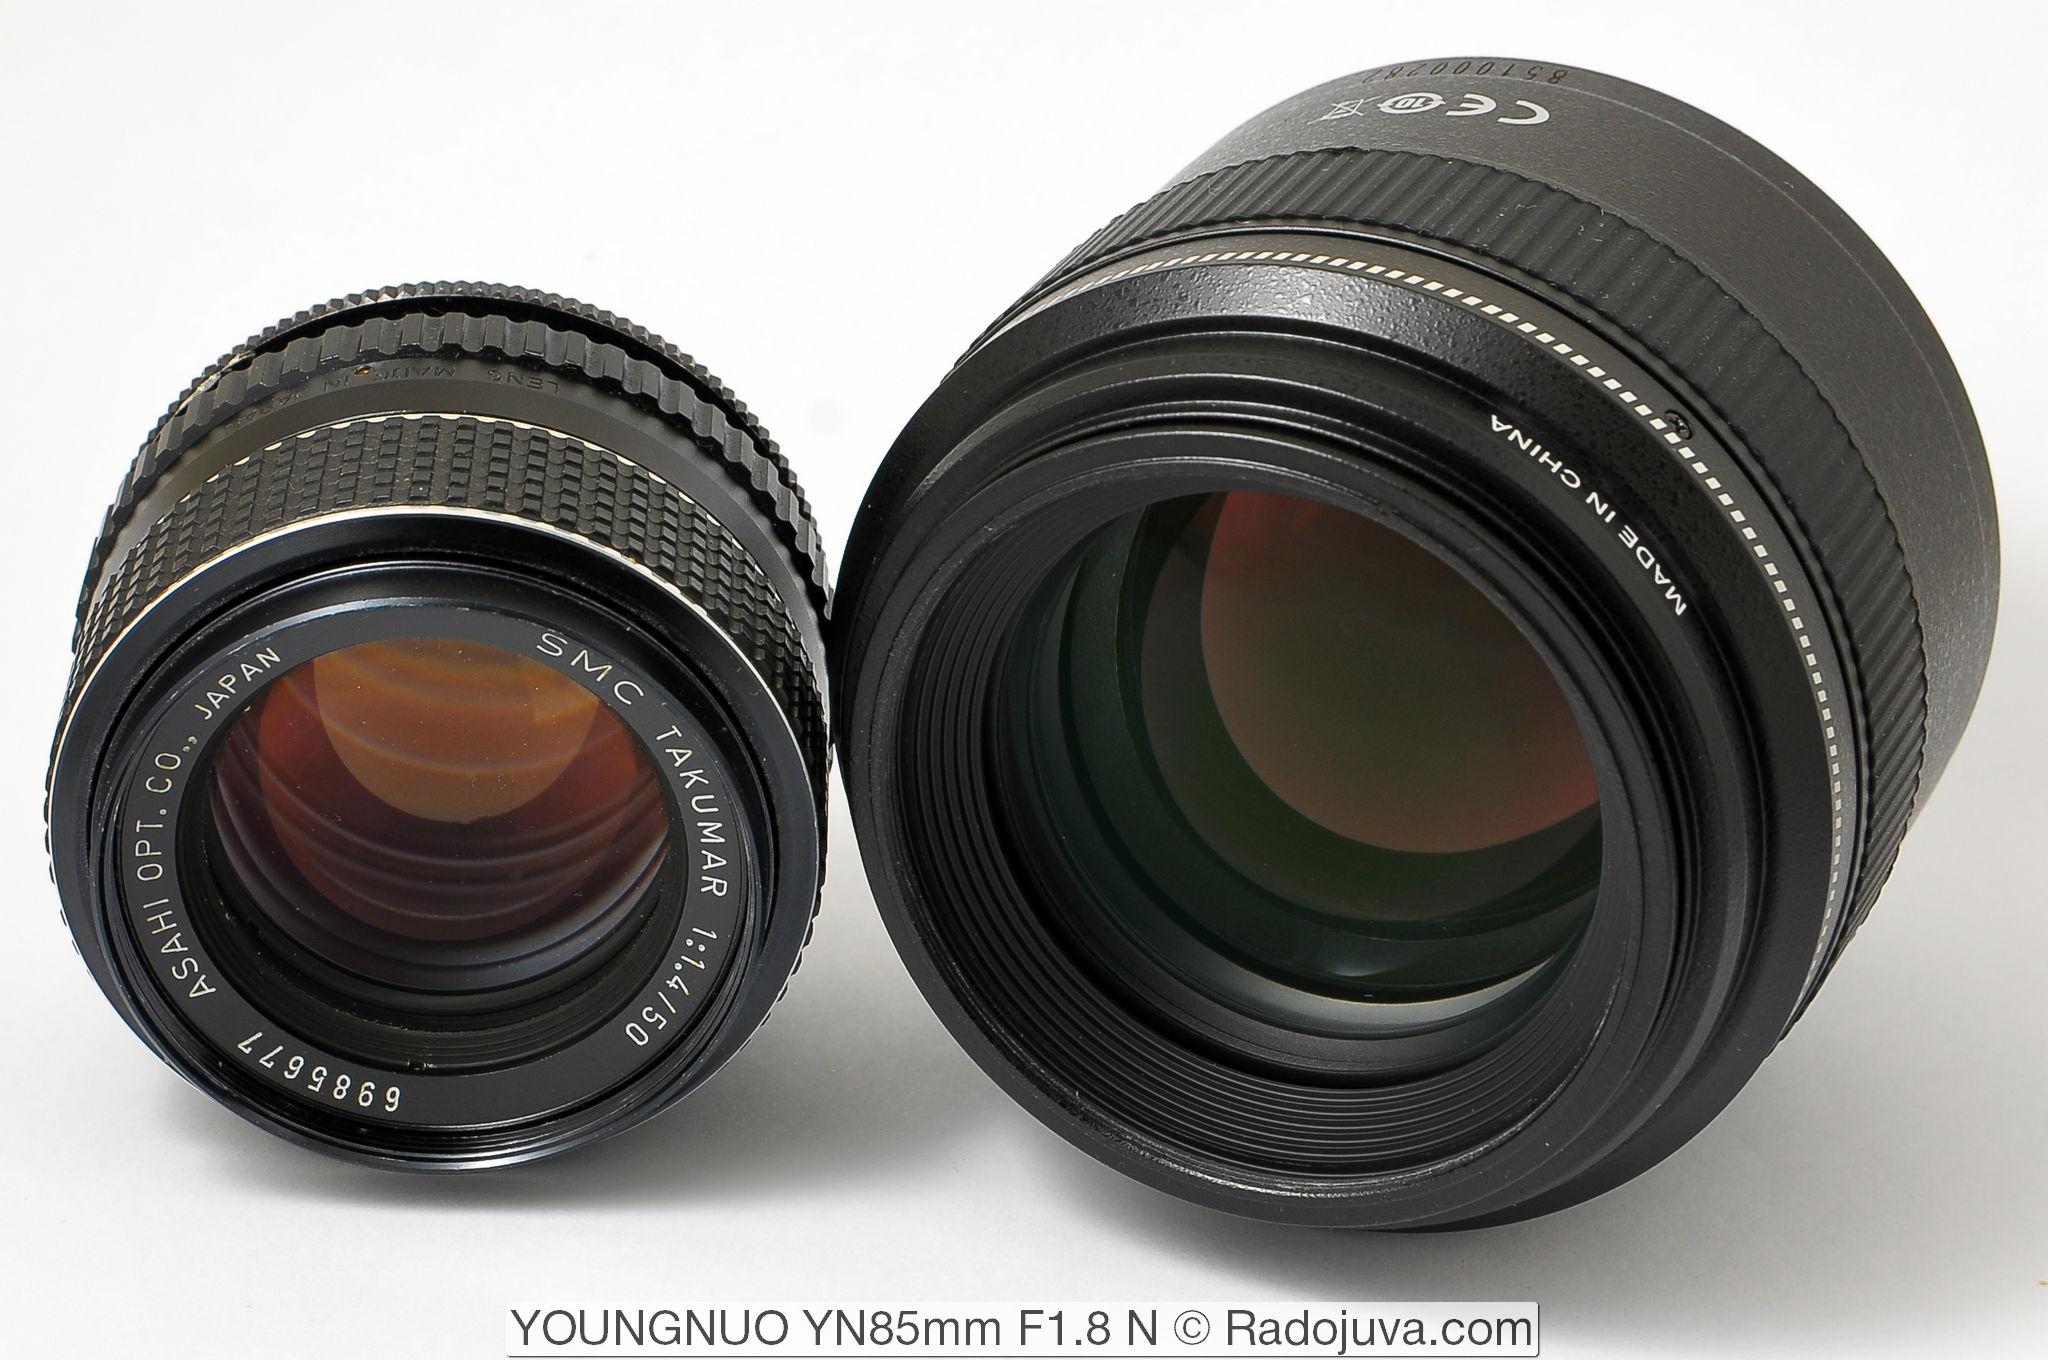 SMC Takumar 1:1.4/50 Asahi OPT. CO., Japan и Yongnuo YN 85mm F1.8 N